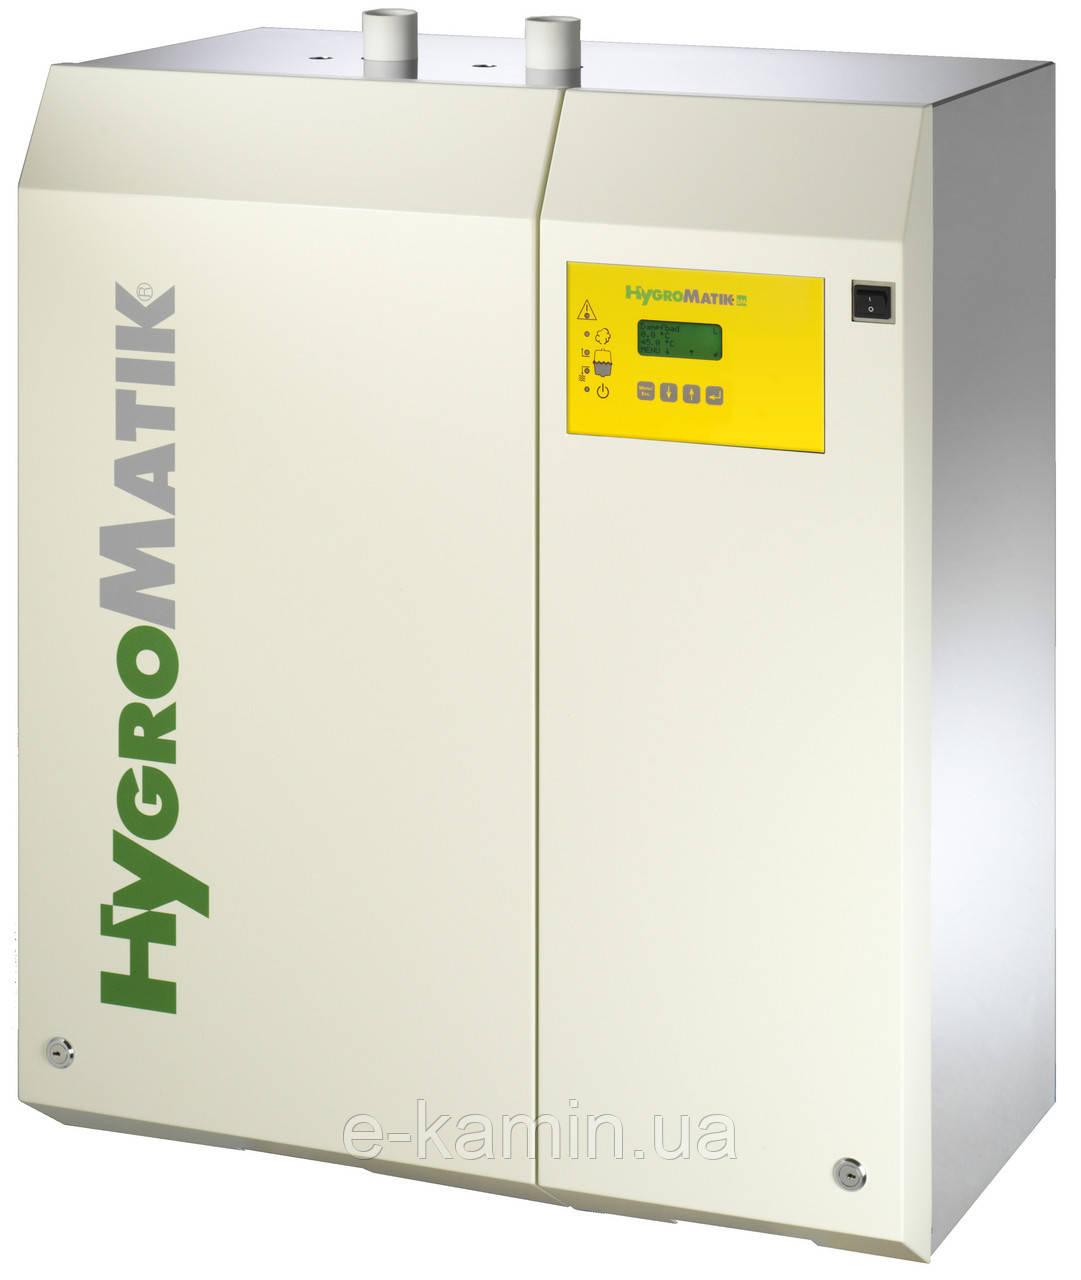 Парогенератор Hygromatik HyLine HY23